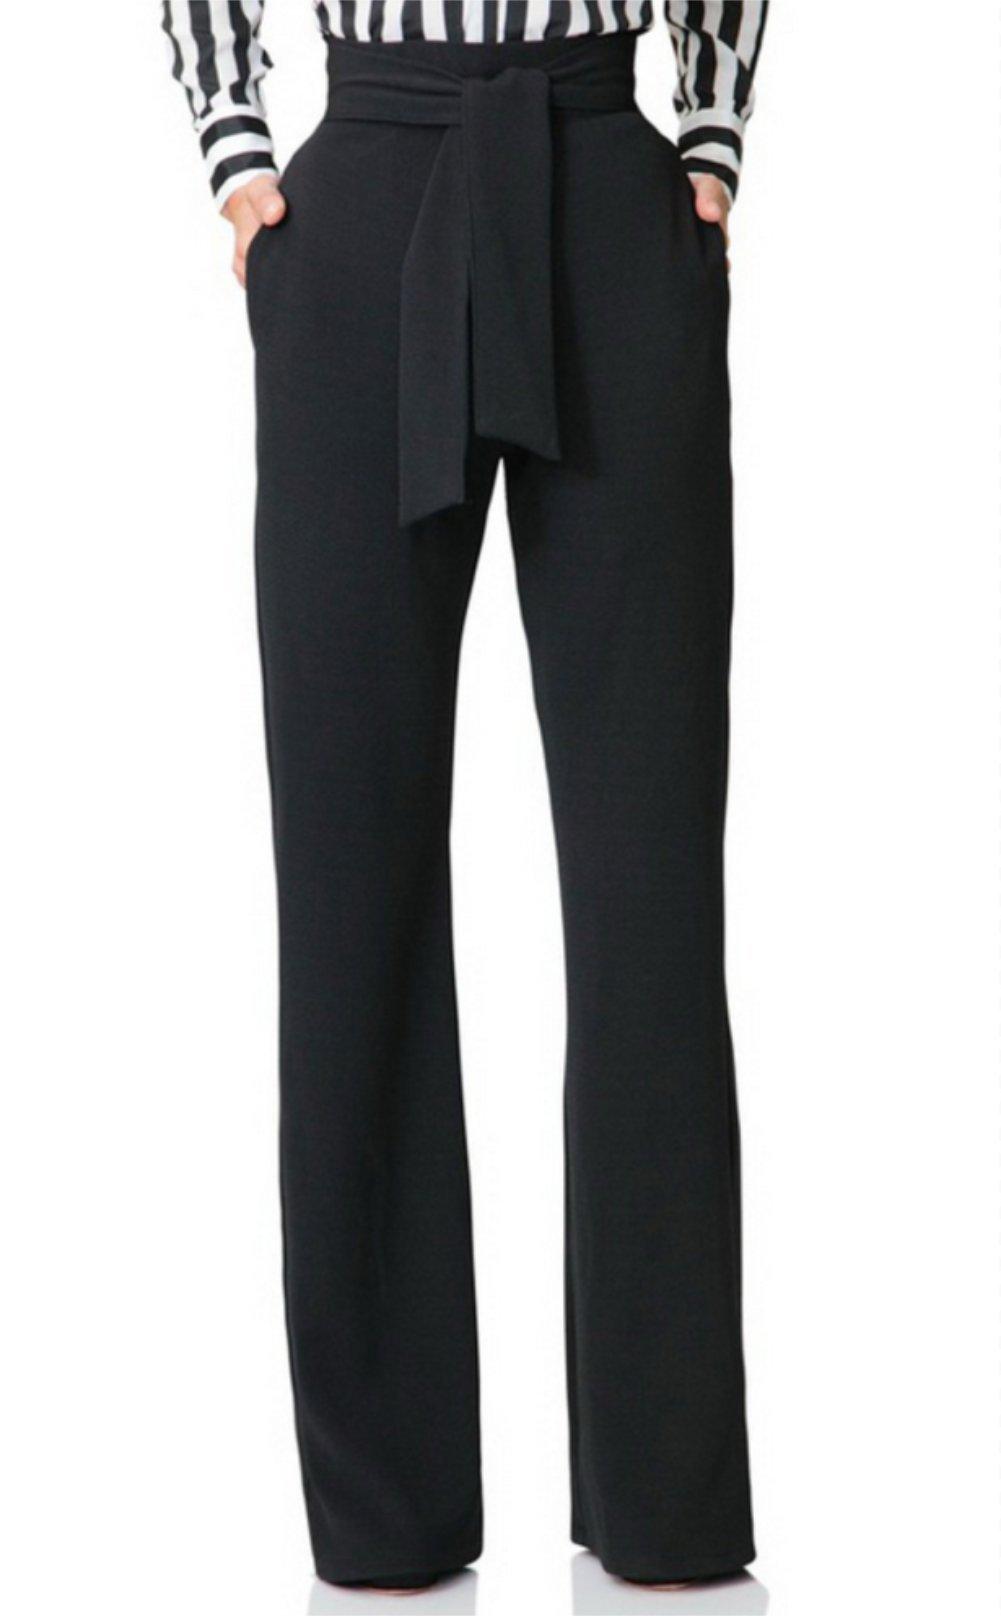 Molisry Women Casual Stretchy Straight Leg High Waisted Long Pants Belt by Molisry